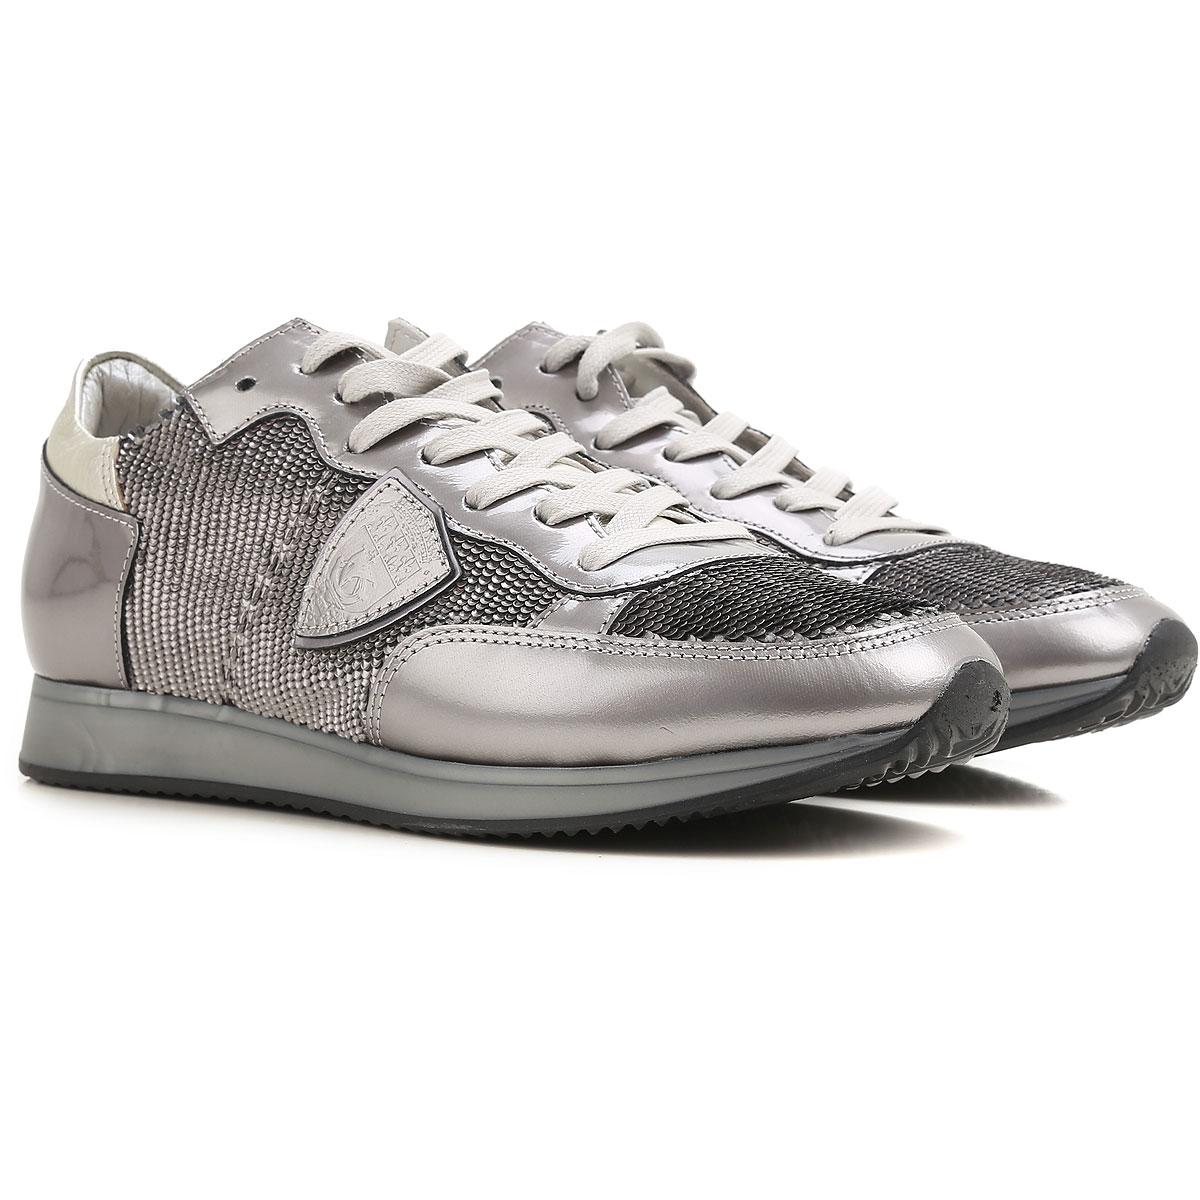 Philippe Model Sneaker Femme , Argent, Cuir Verni, 2017, 37 38 40